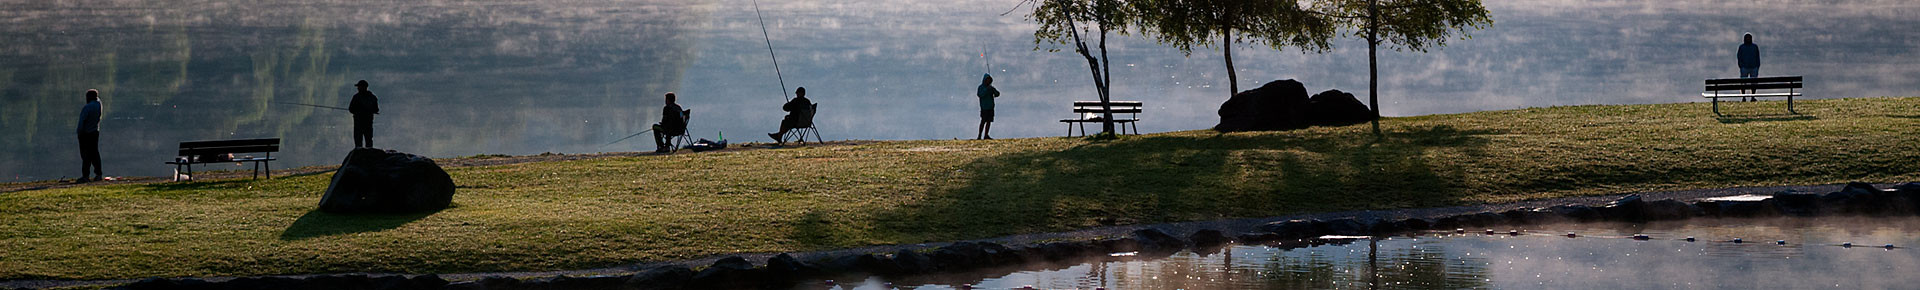 Pêche en Vallée d'Aulps